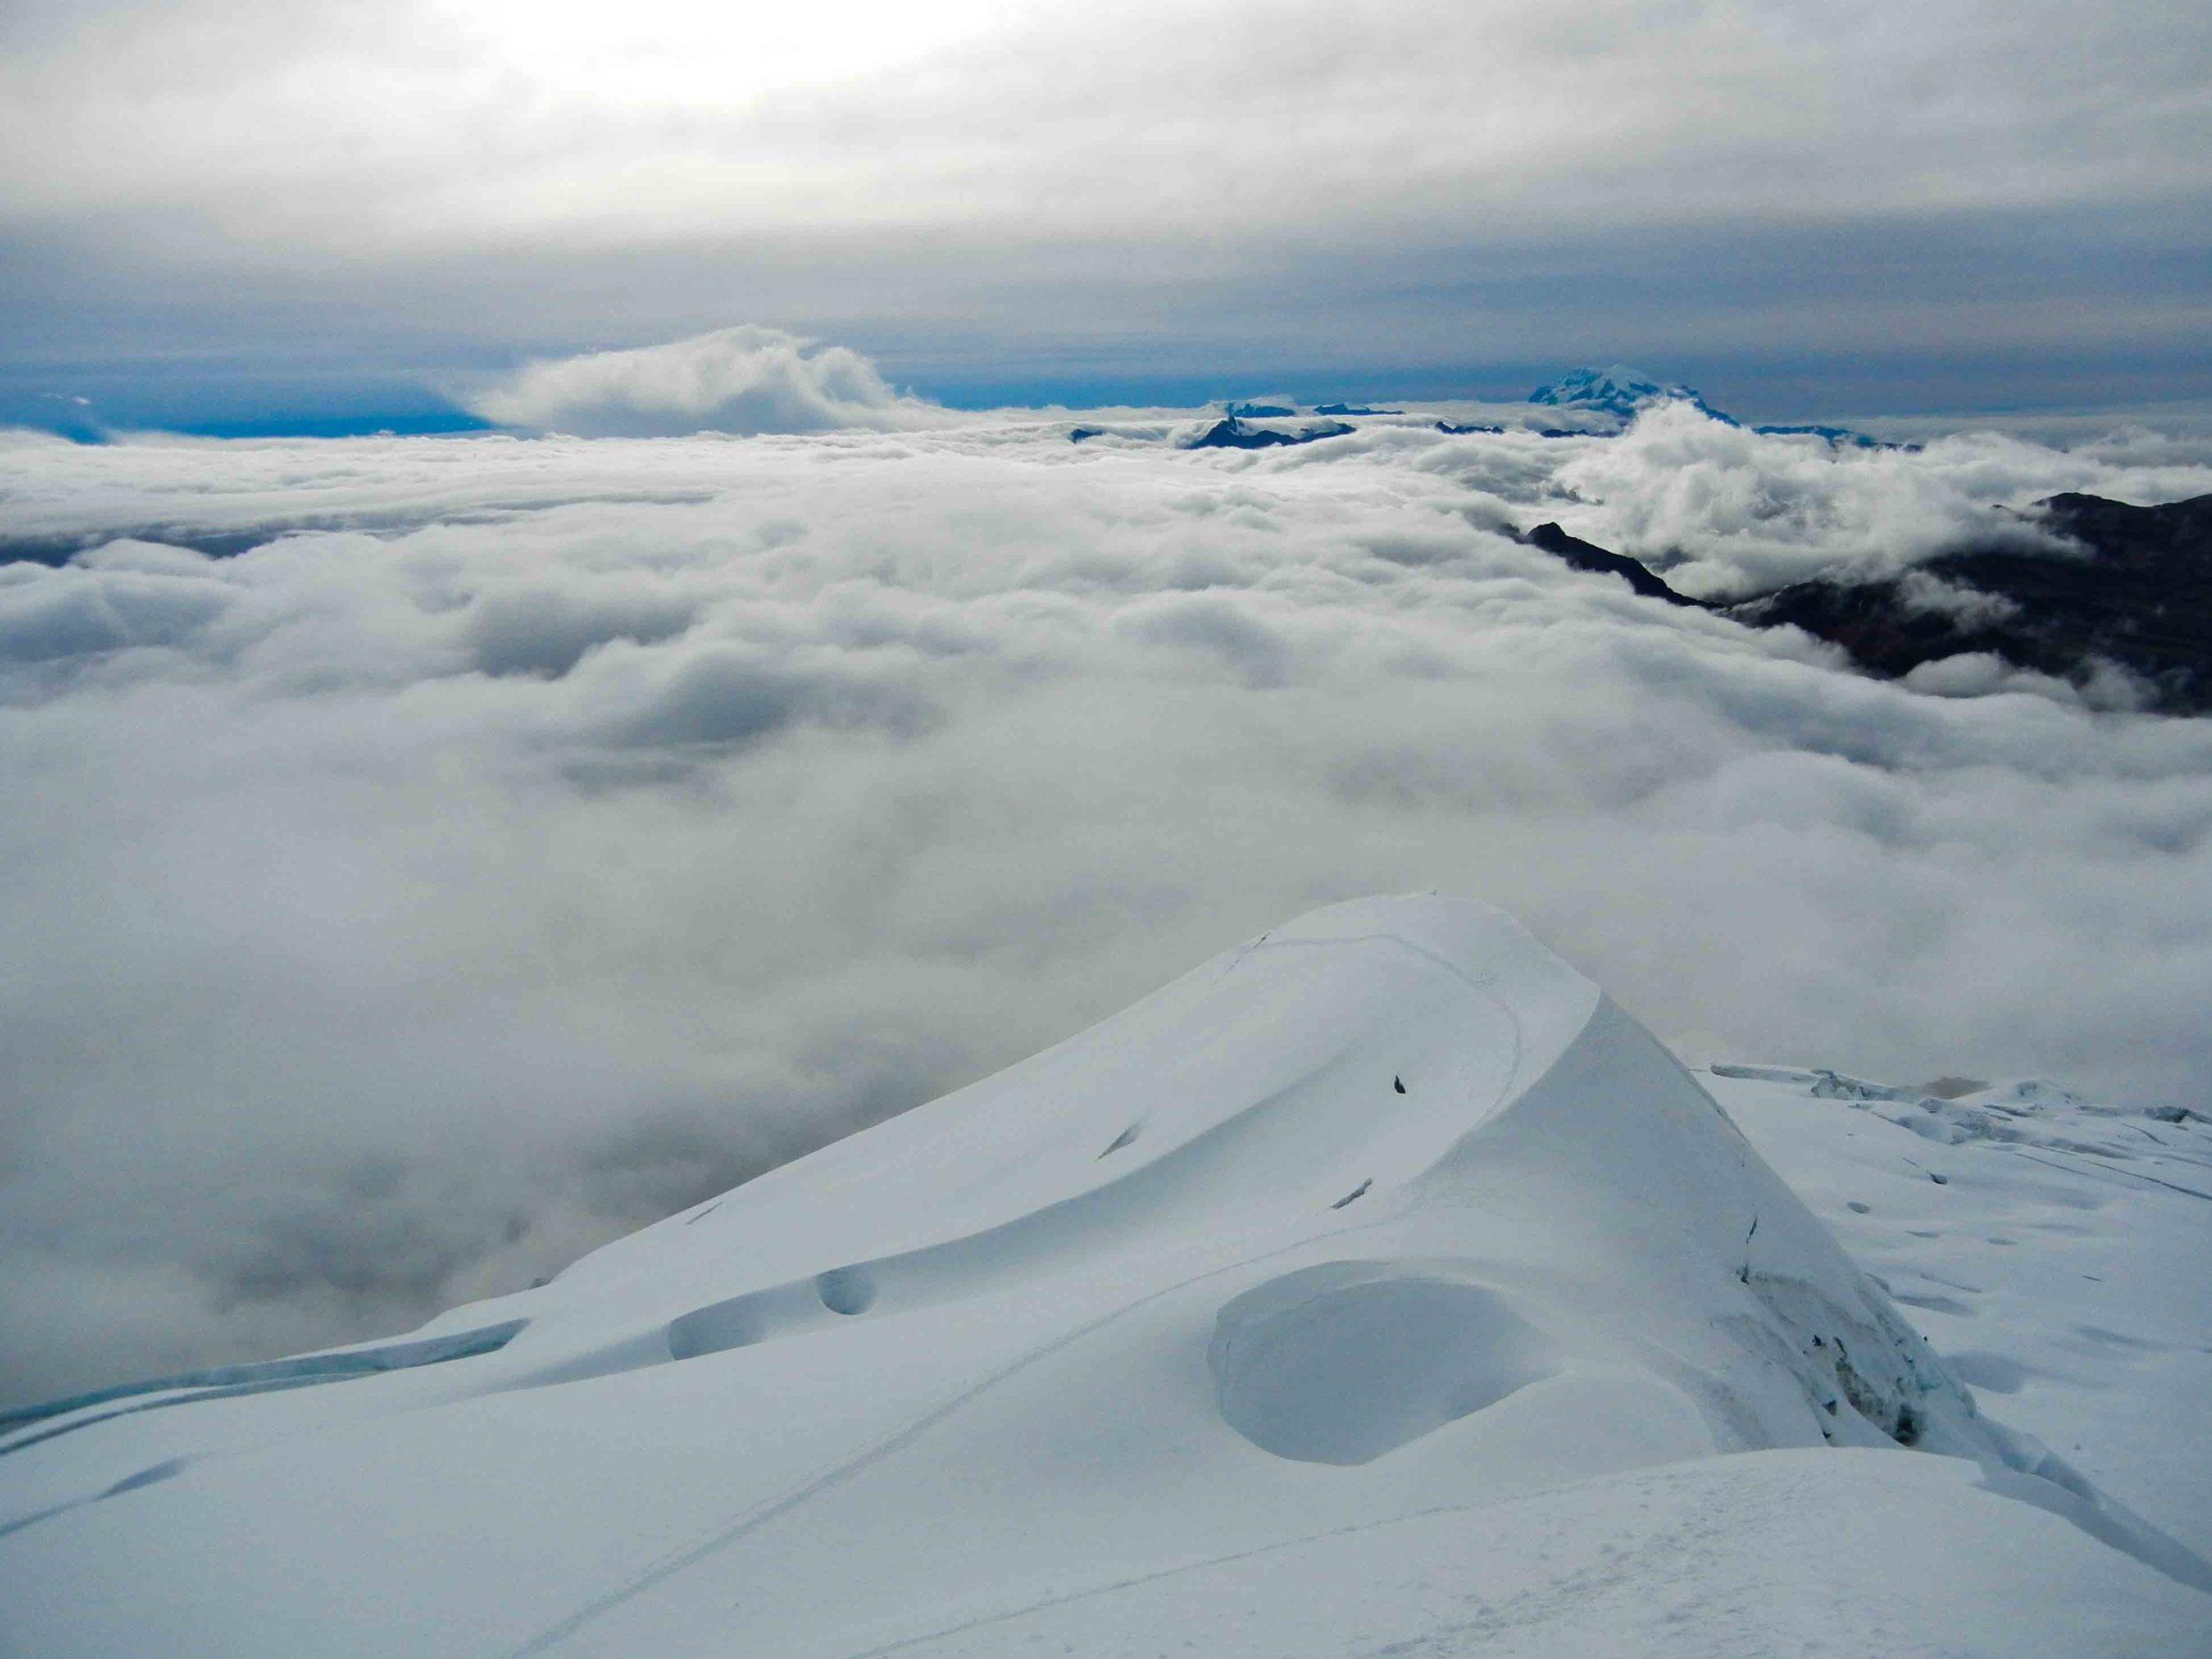 2015_12_S_LaPaz_IceClimbing-9.jpg